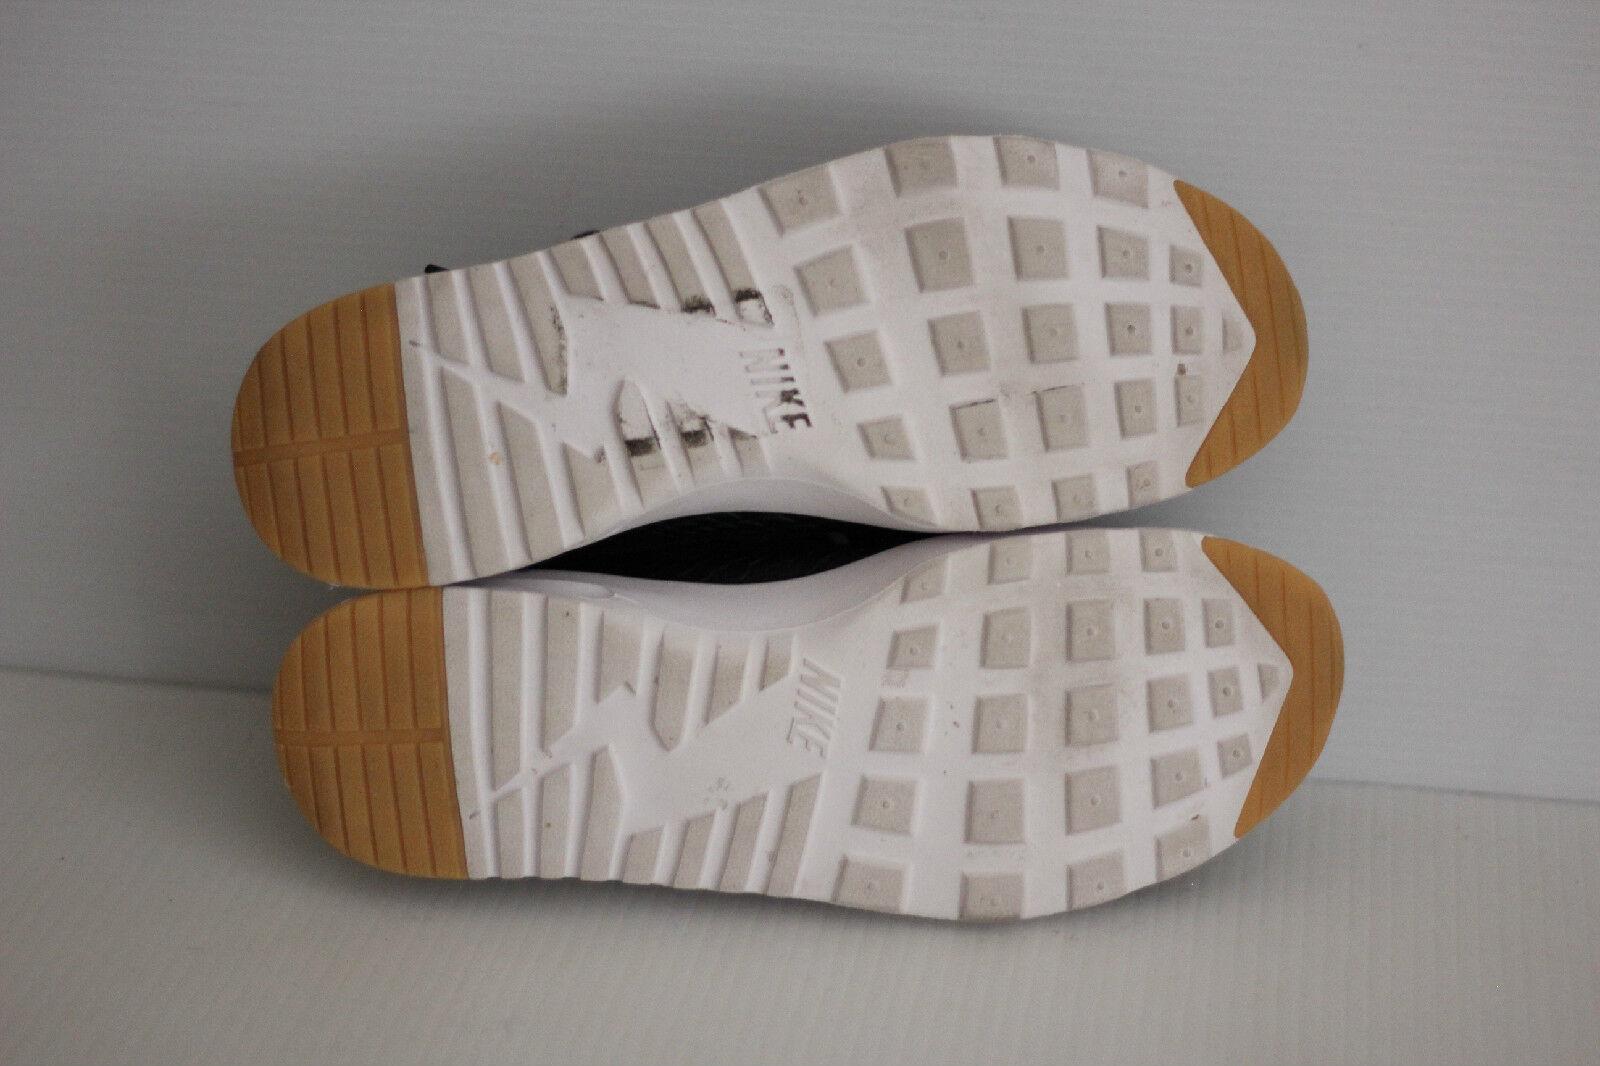 NEW Nike Nike Nike Air Max Thea Premium Women's Sneaker Trainers - Black - Size 9US  (C97) 7a9322